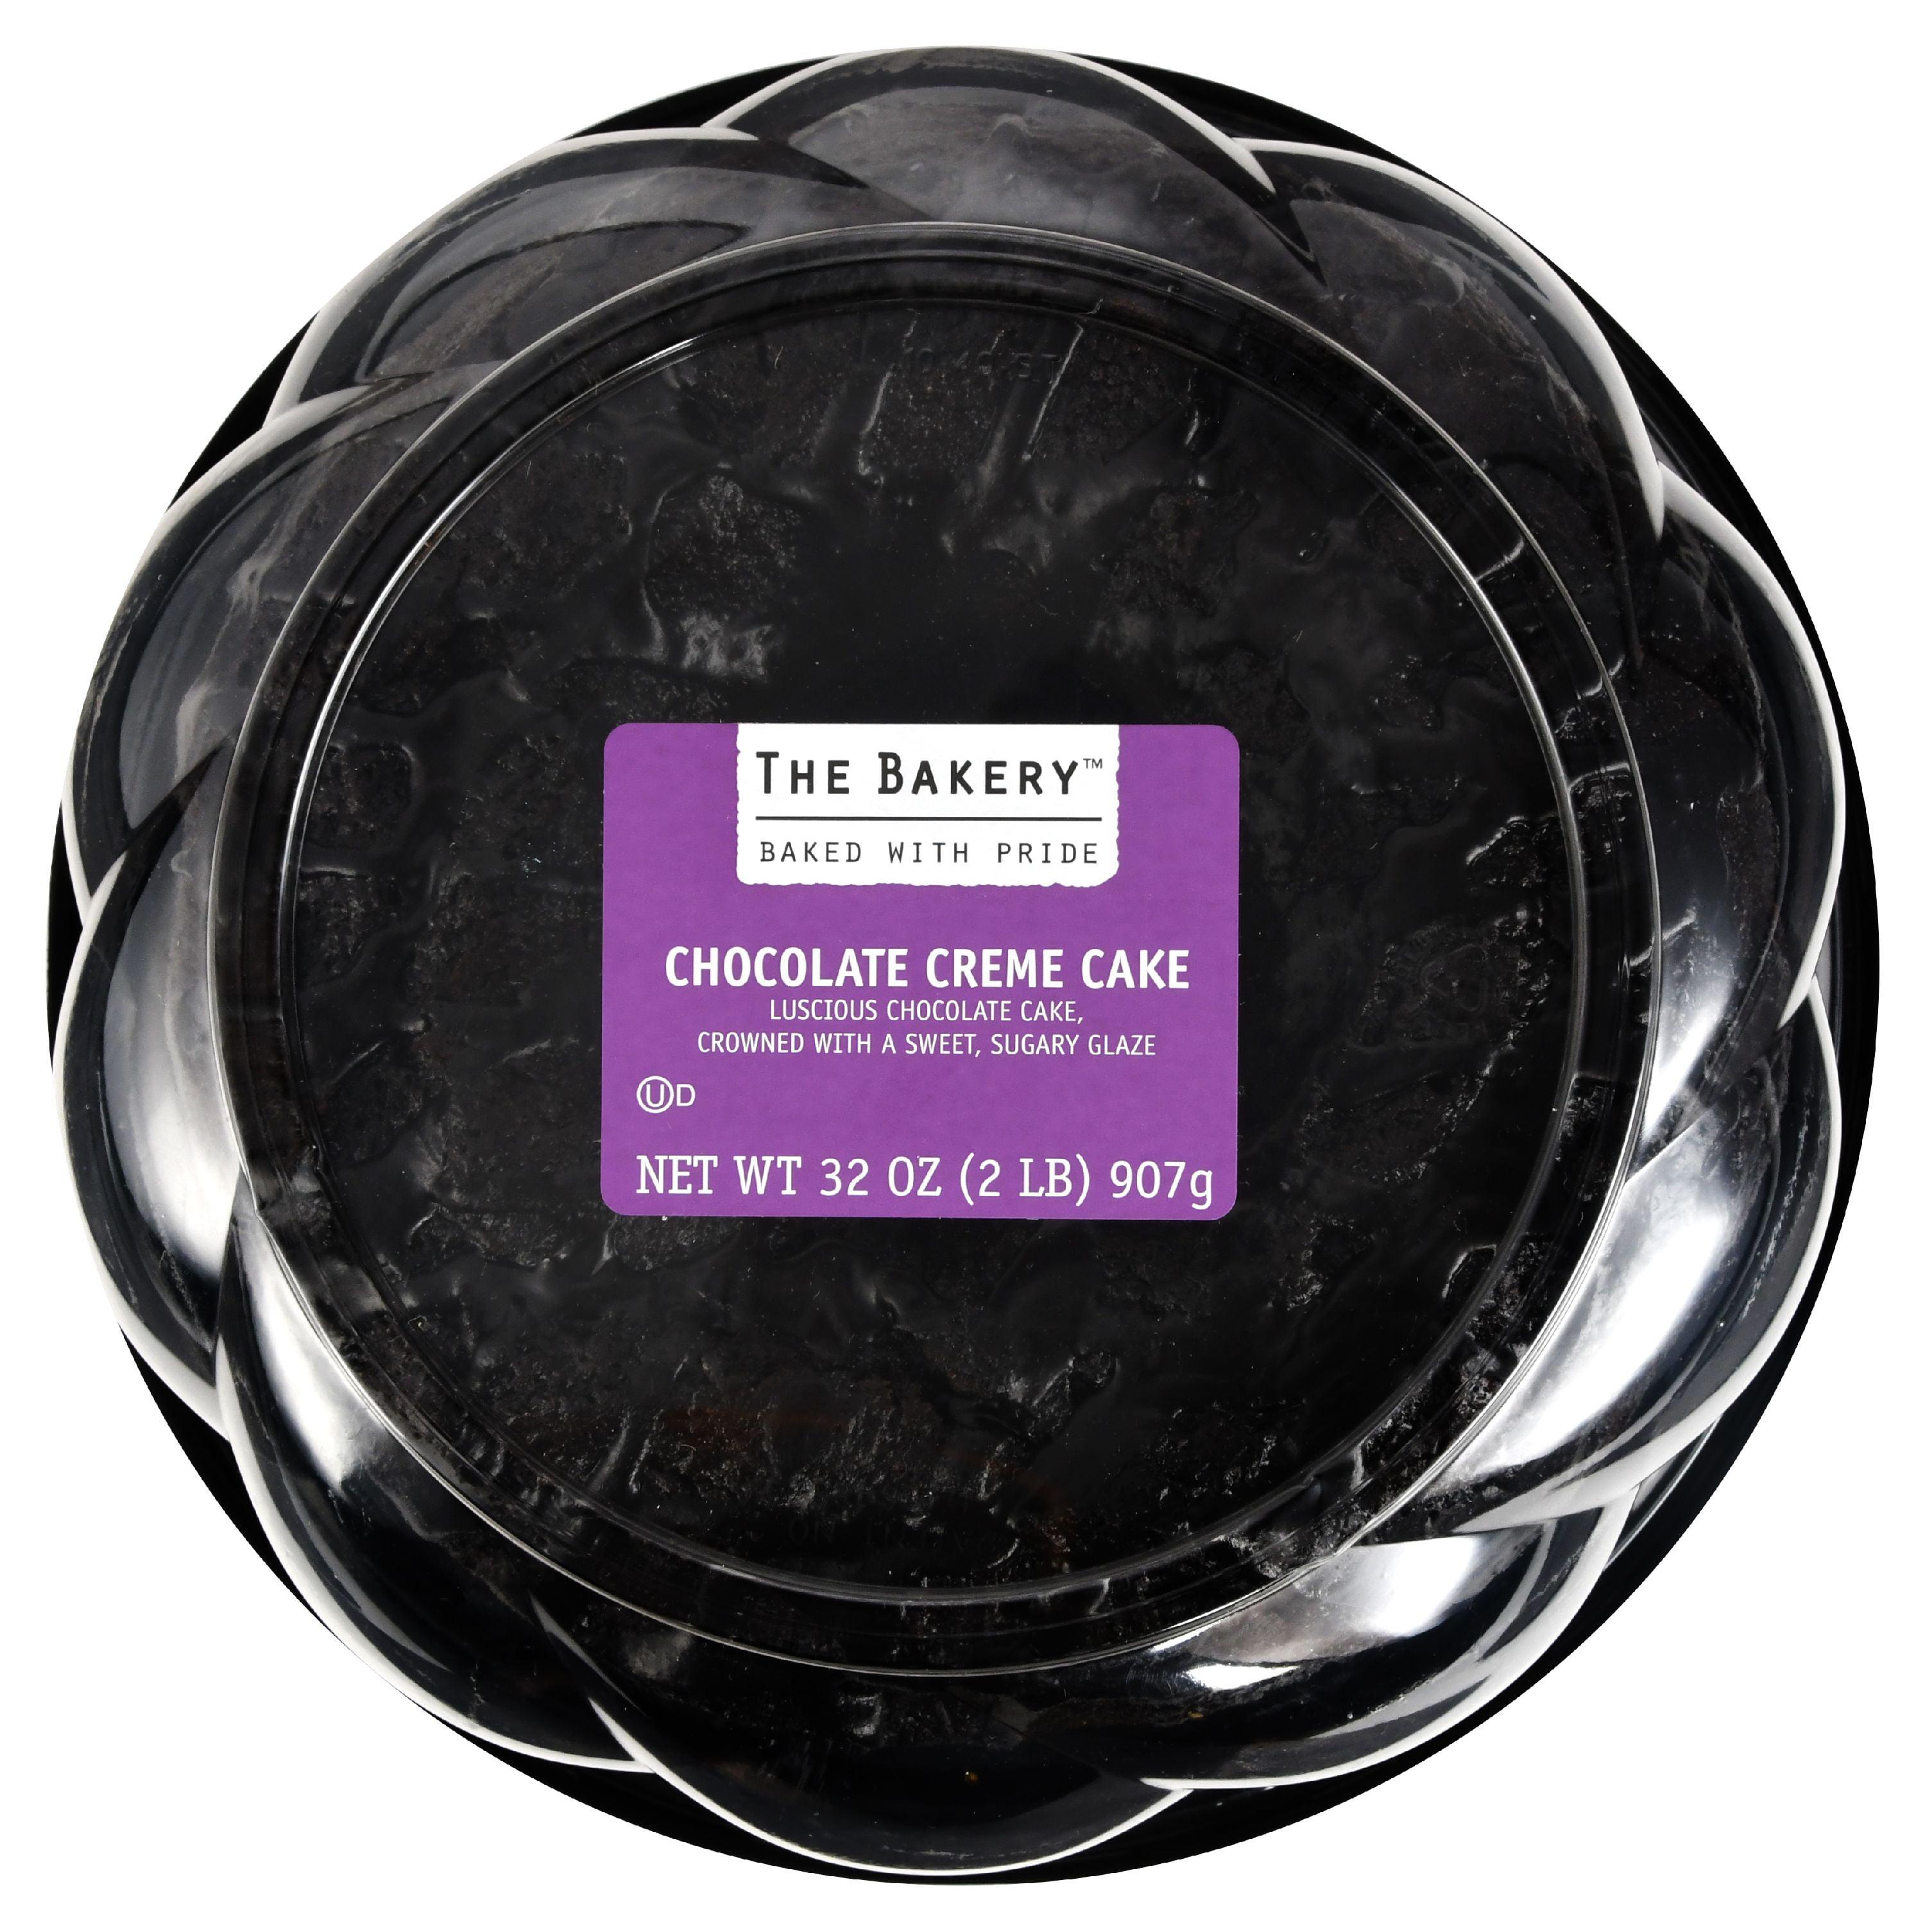 The Bakery Chocolate Crème Cake, 32 oz